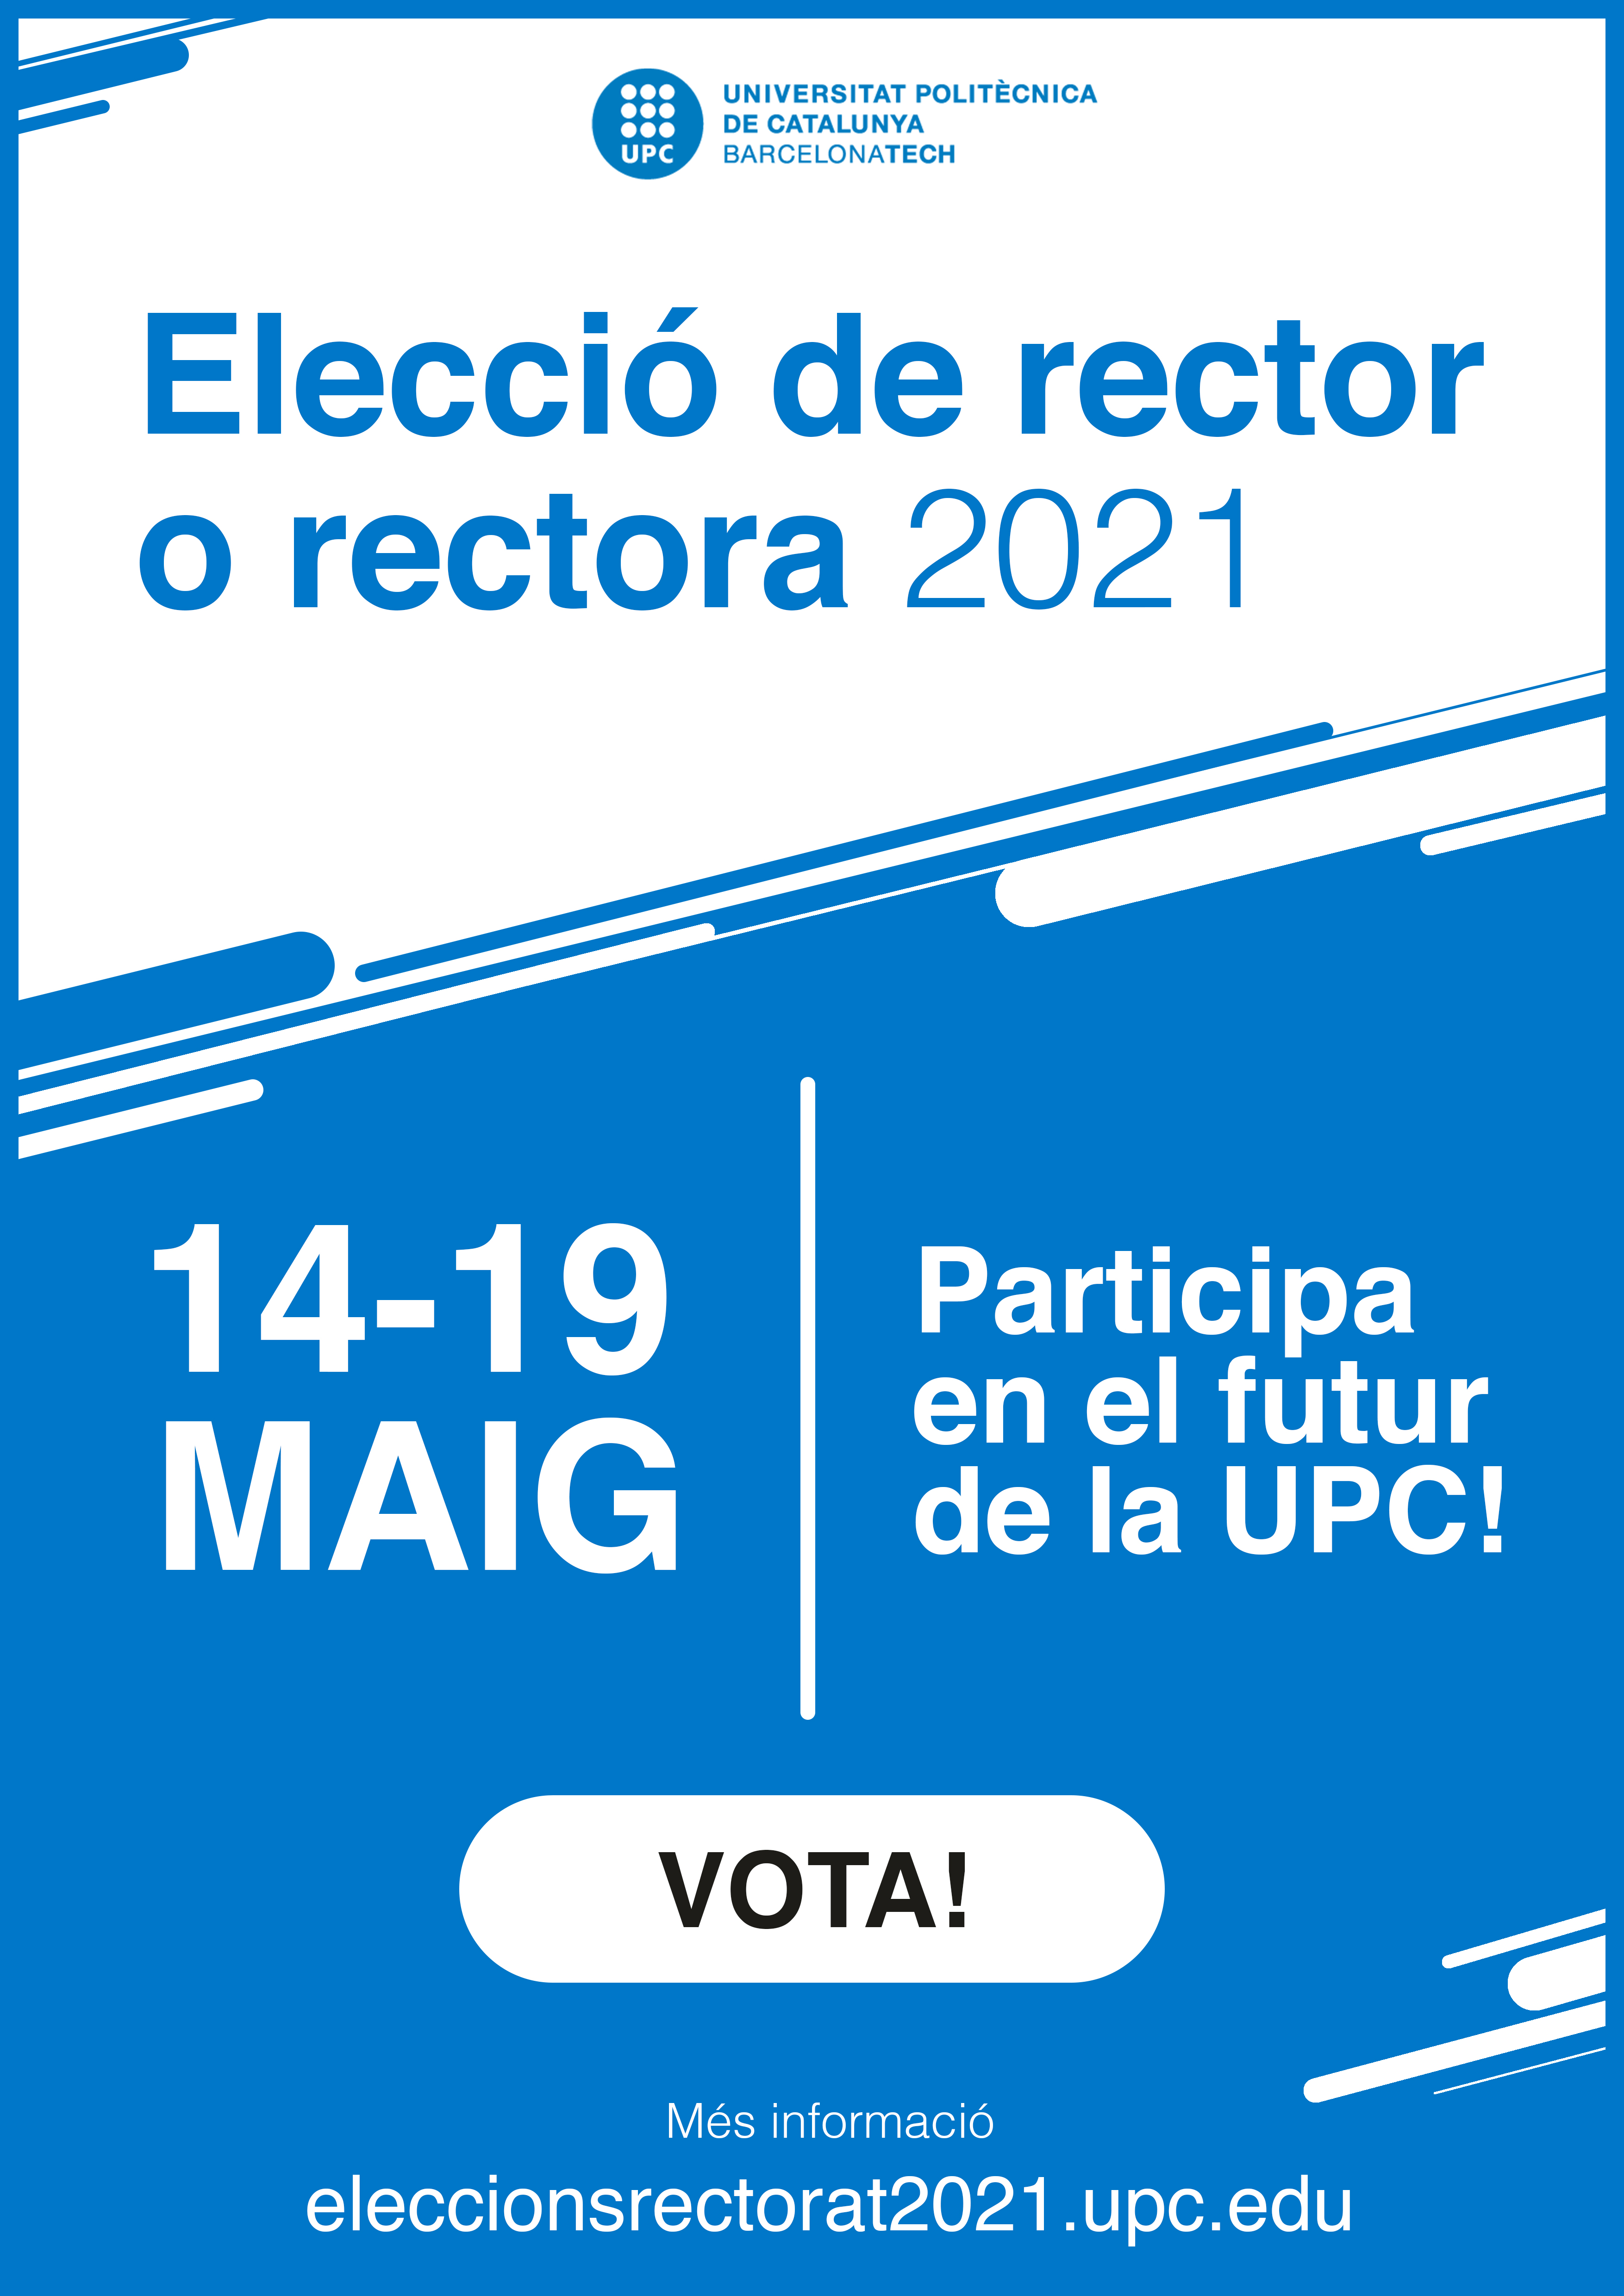 Eleccions rector cartell.jpg